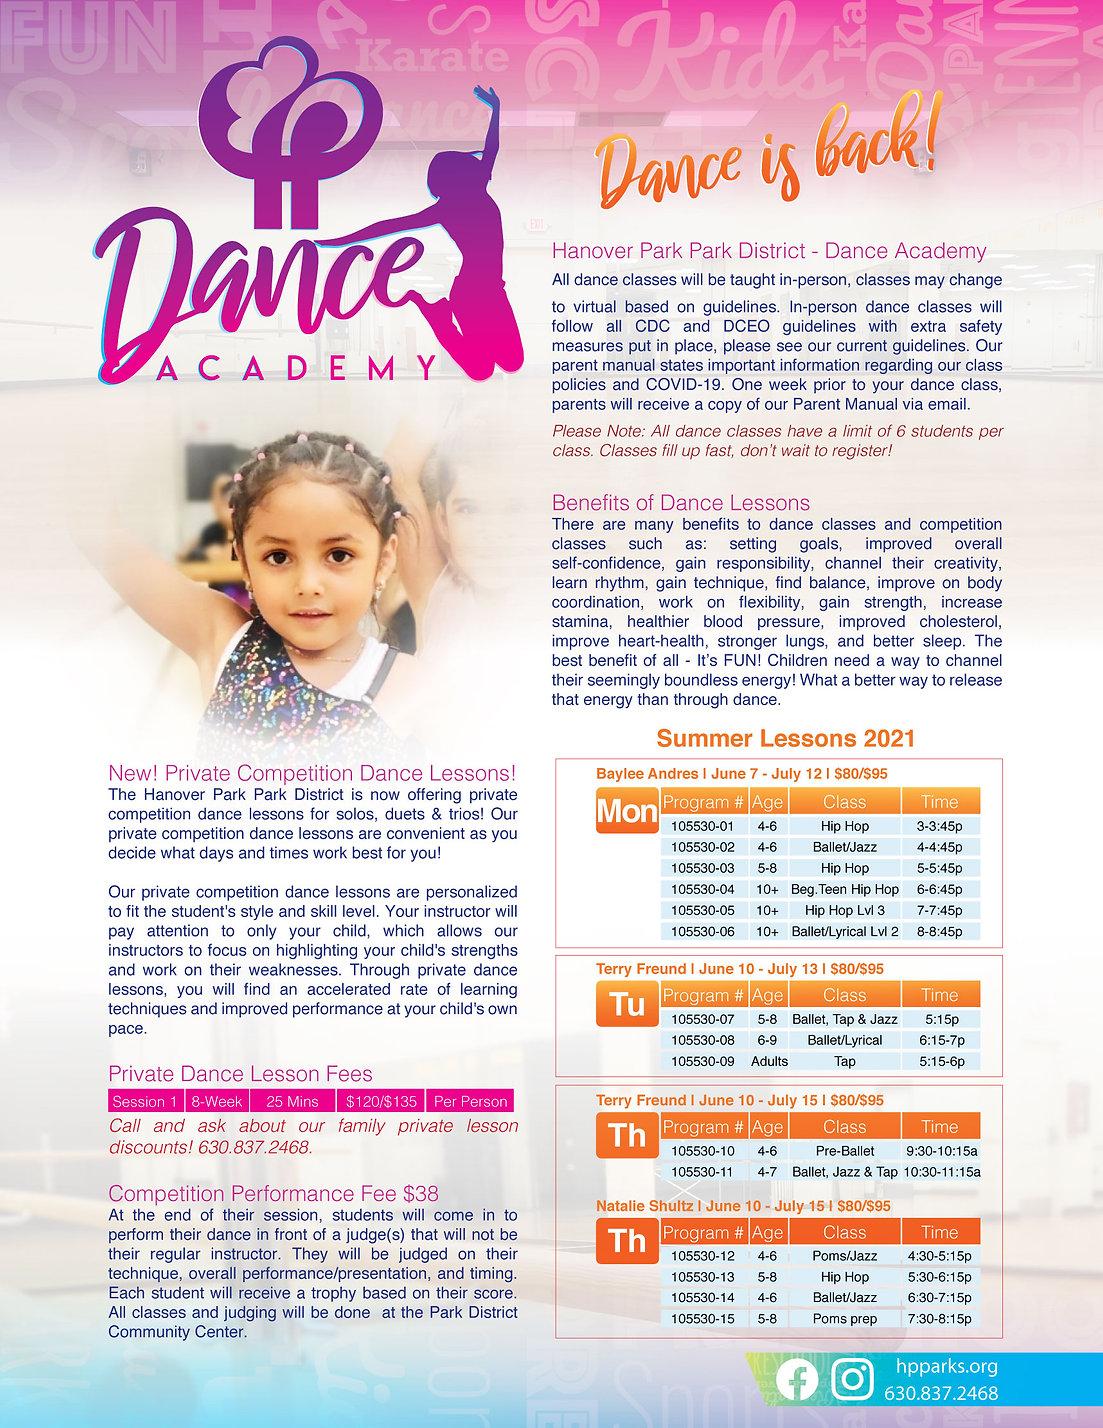 Dance-Academy-Summer--hpparks.org-2021.j